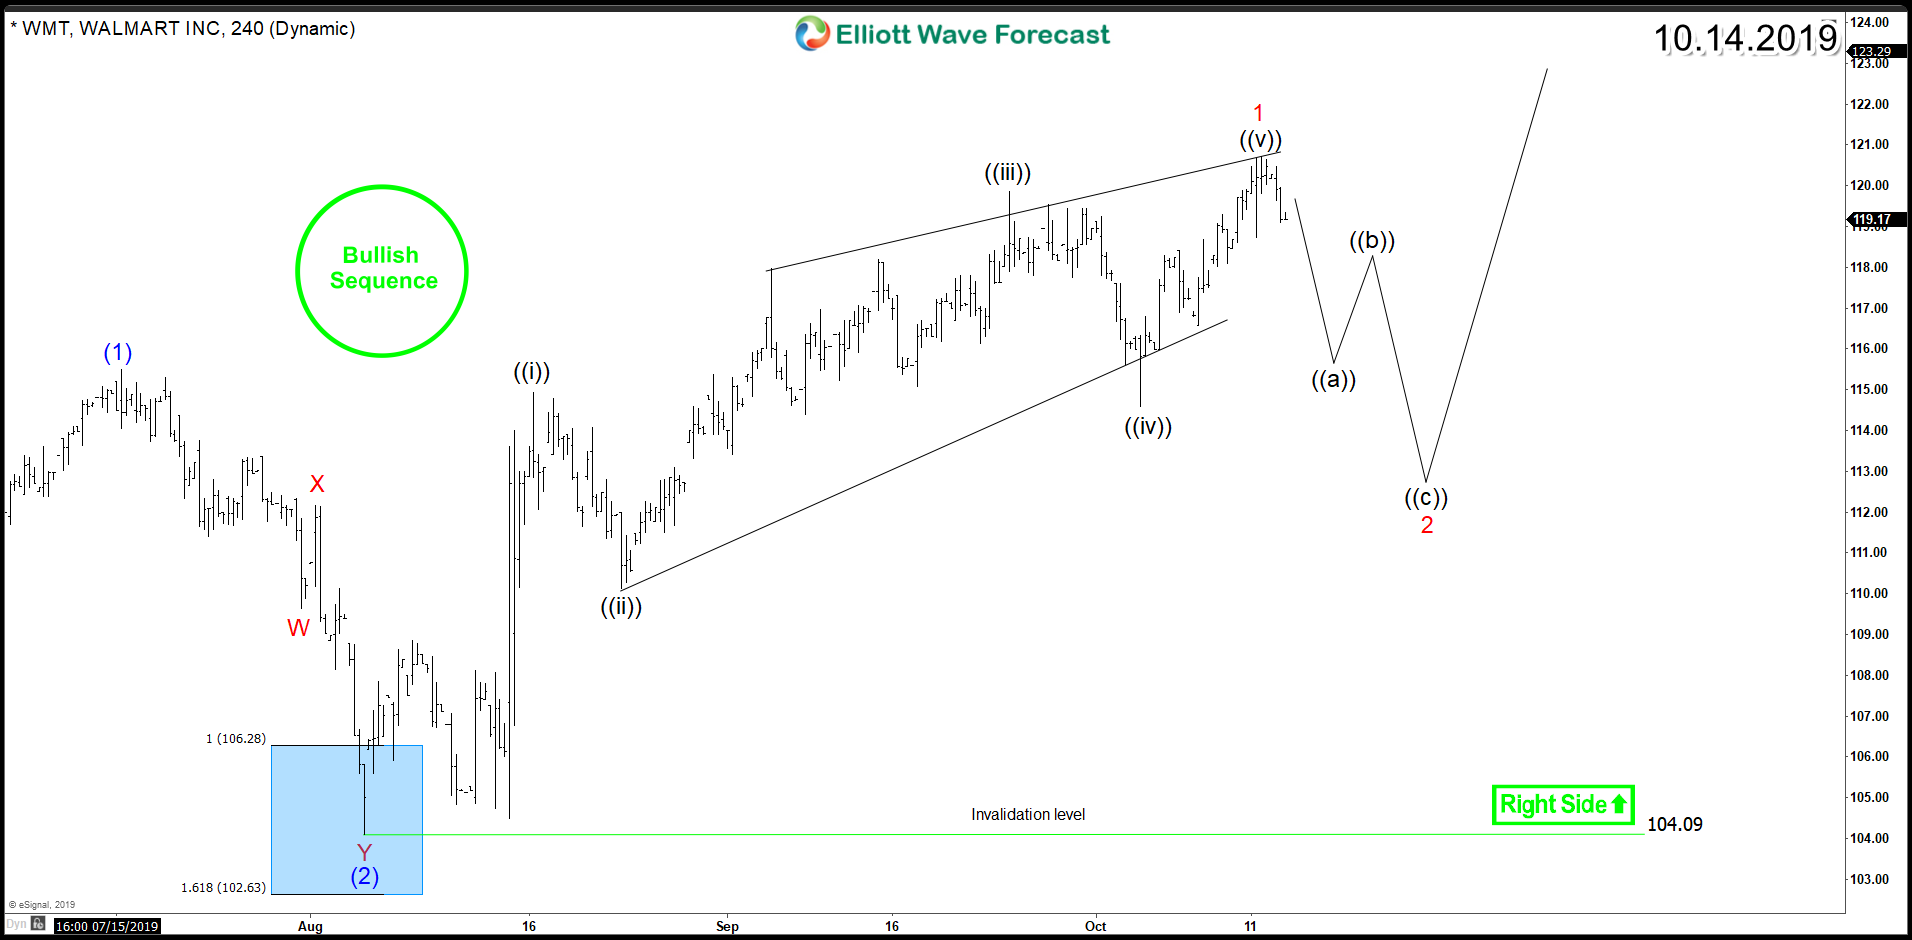 Walmart (NYSE: WMT) Bull Run Leads the Market